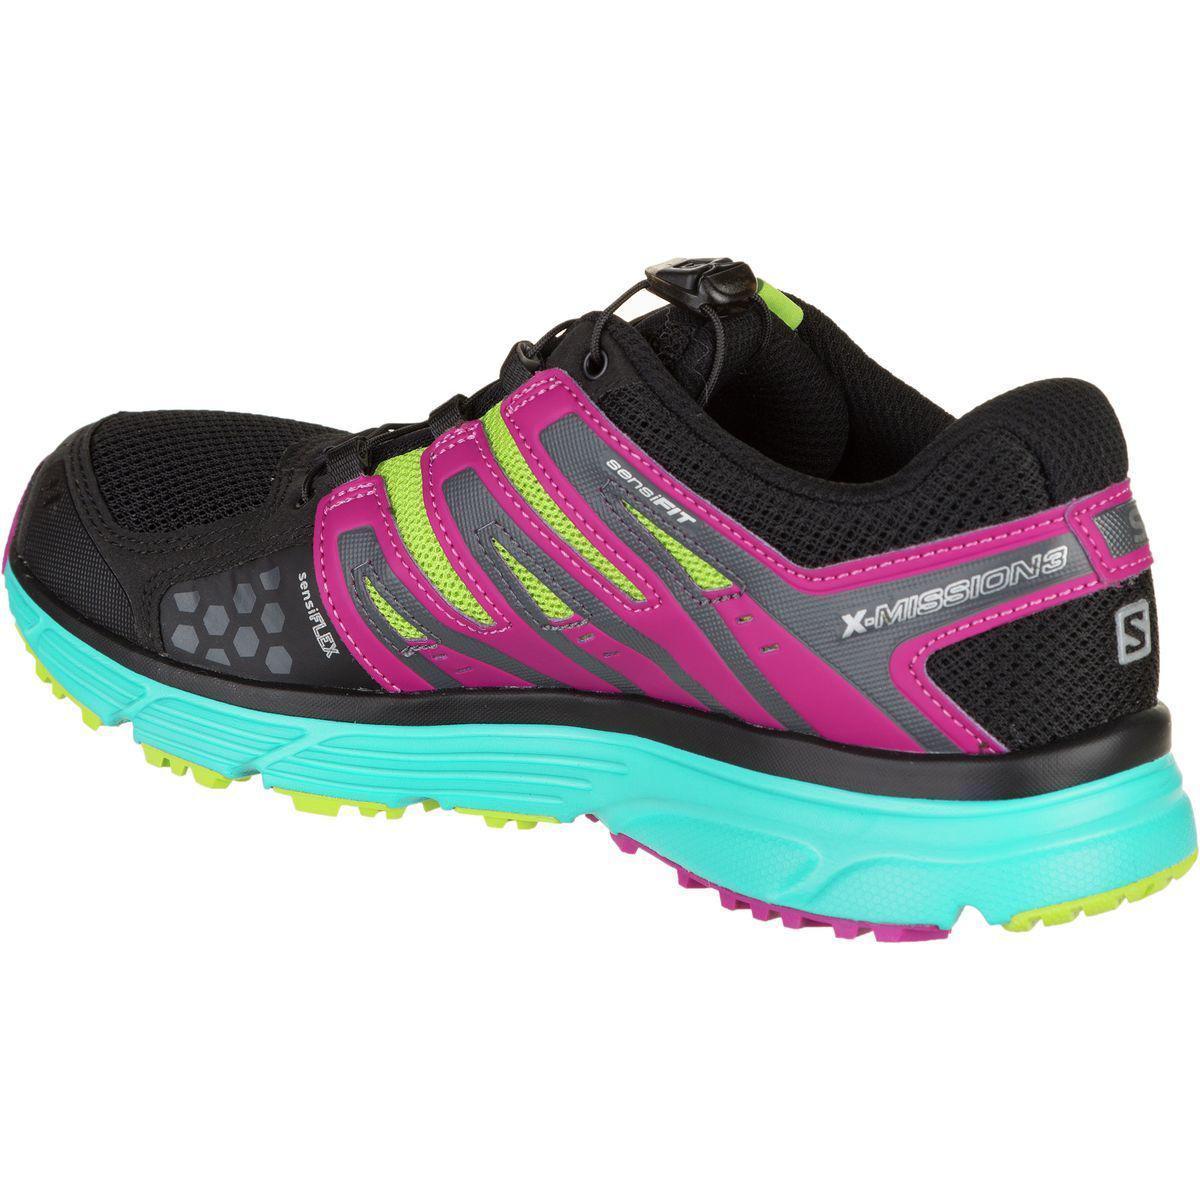 344fef39db5f Yves Salomon - Multicolor X-mission 3 Cs Trail Running Shoe - Lyst. View  fullscreen